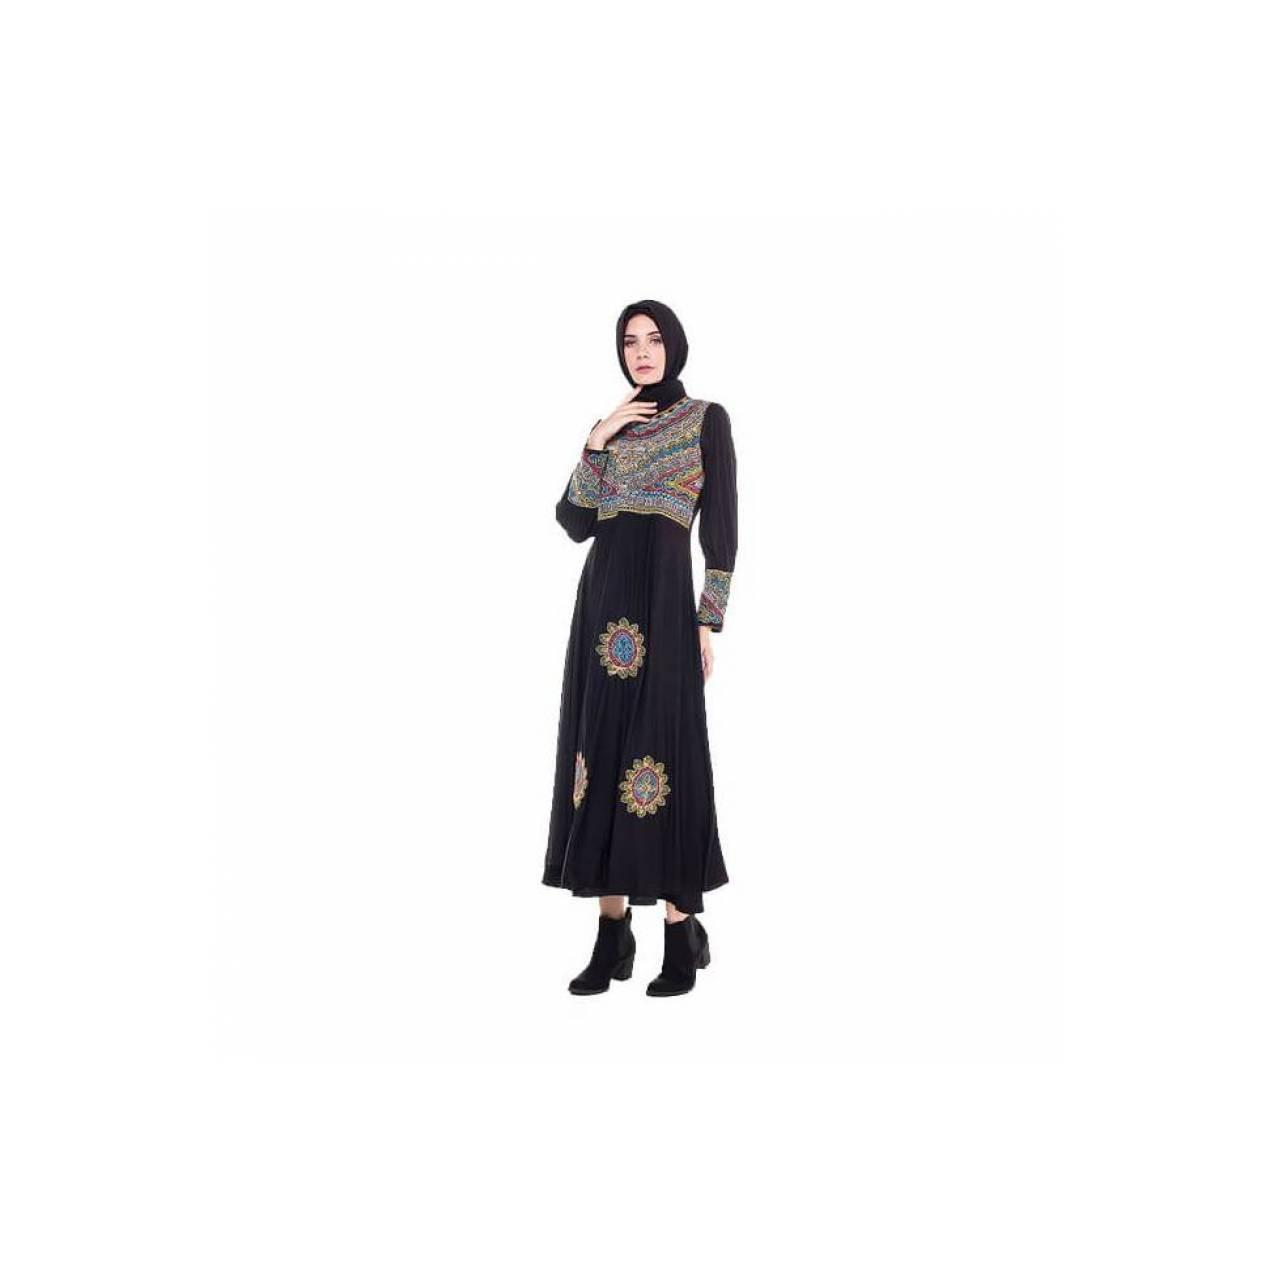 Baju Gamis Brokat / Vamosh Jersey Terbaru Java7 HNS 303